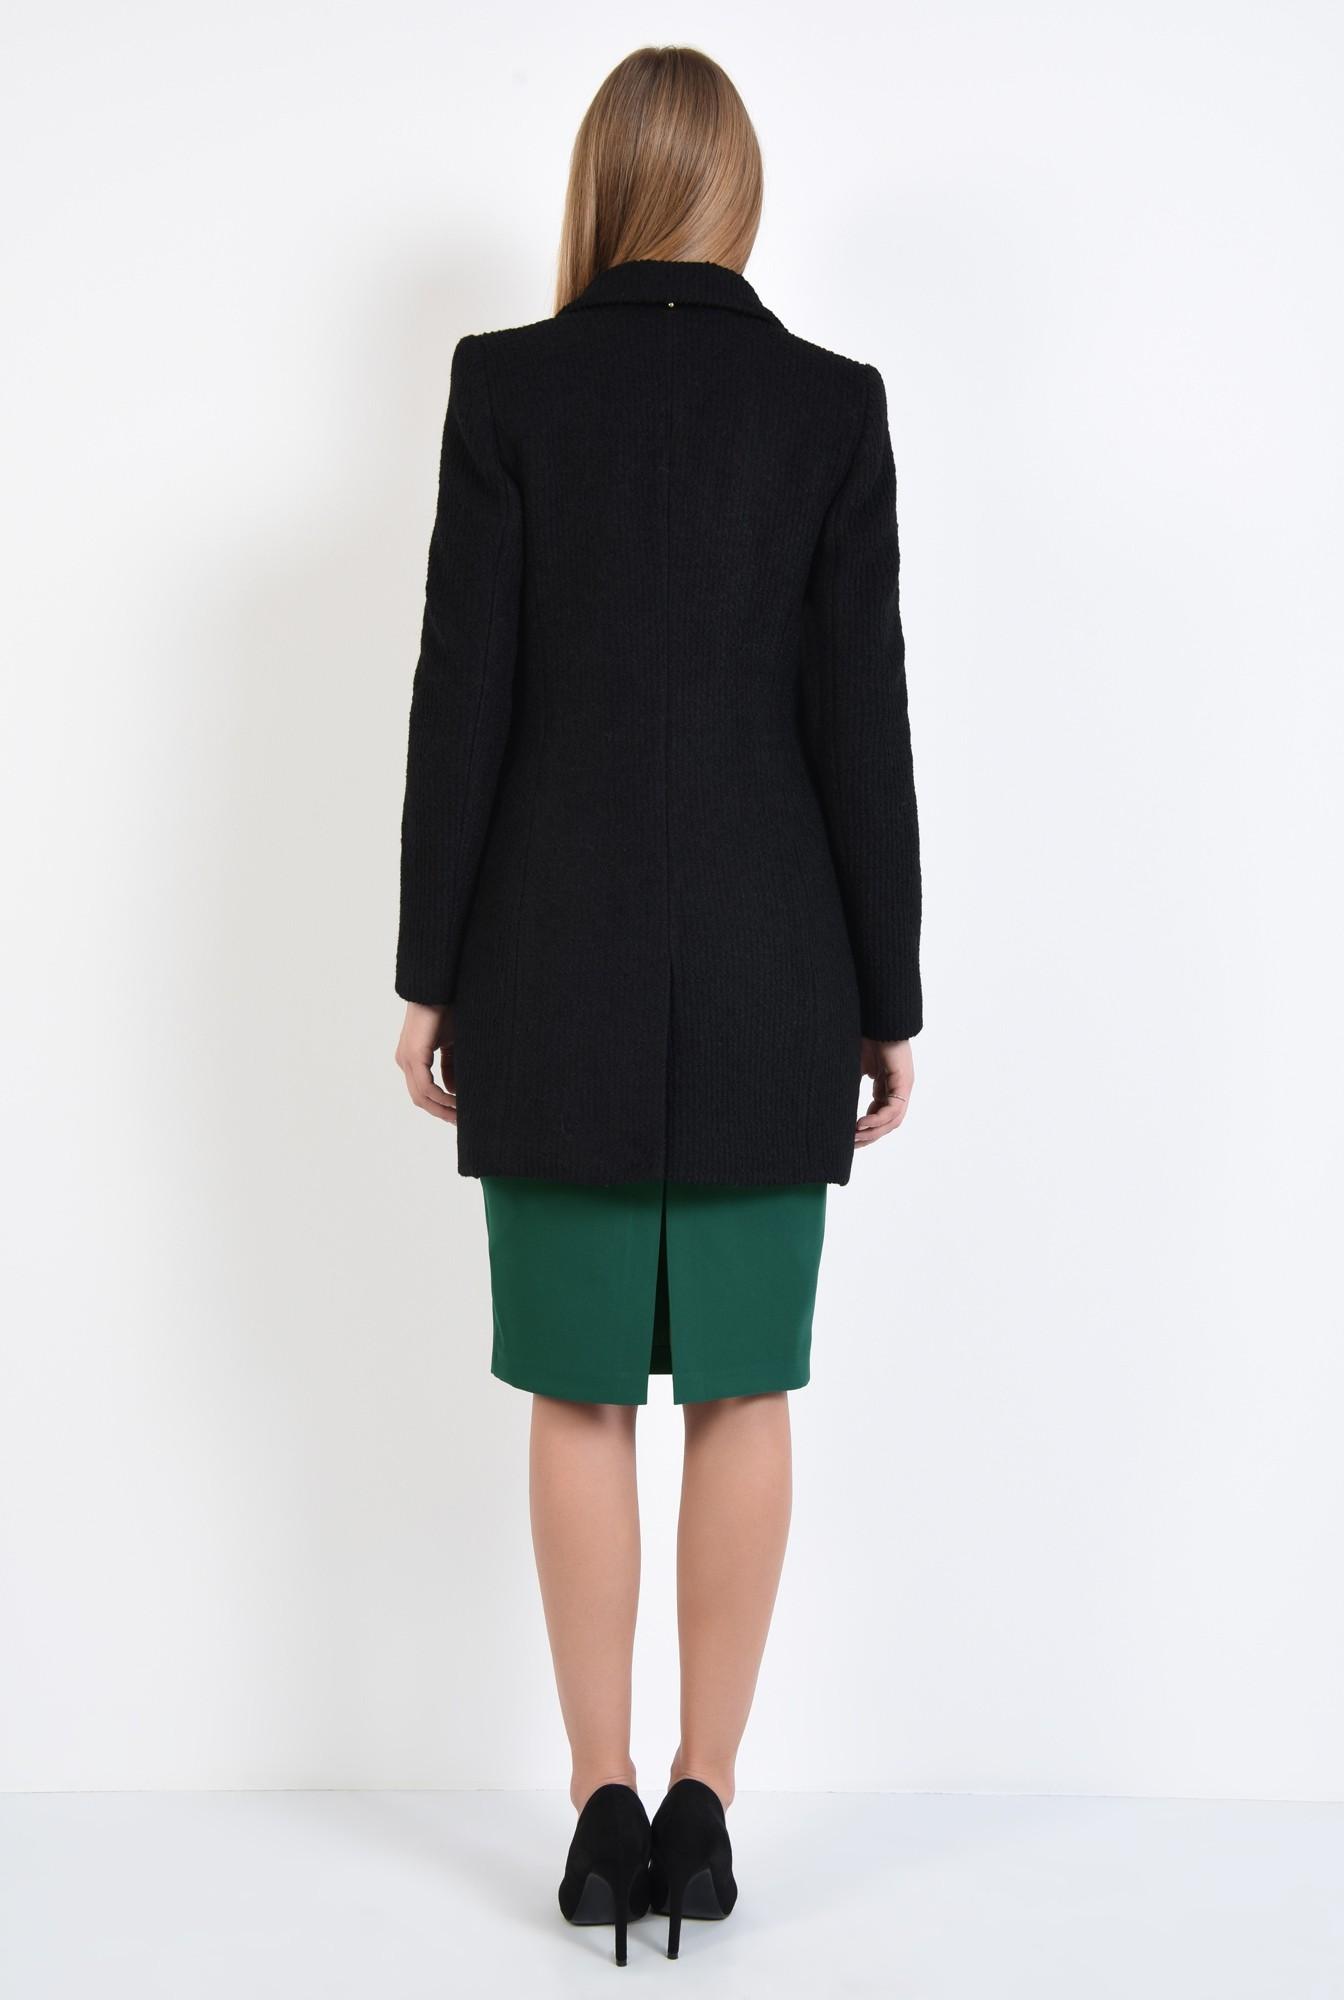 1 - palton dama, online, negru, drept, doua randuri de nasturi